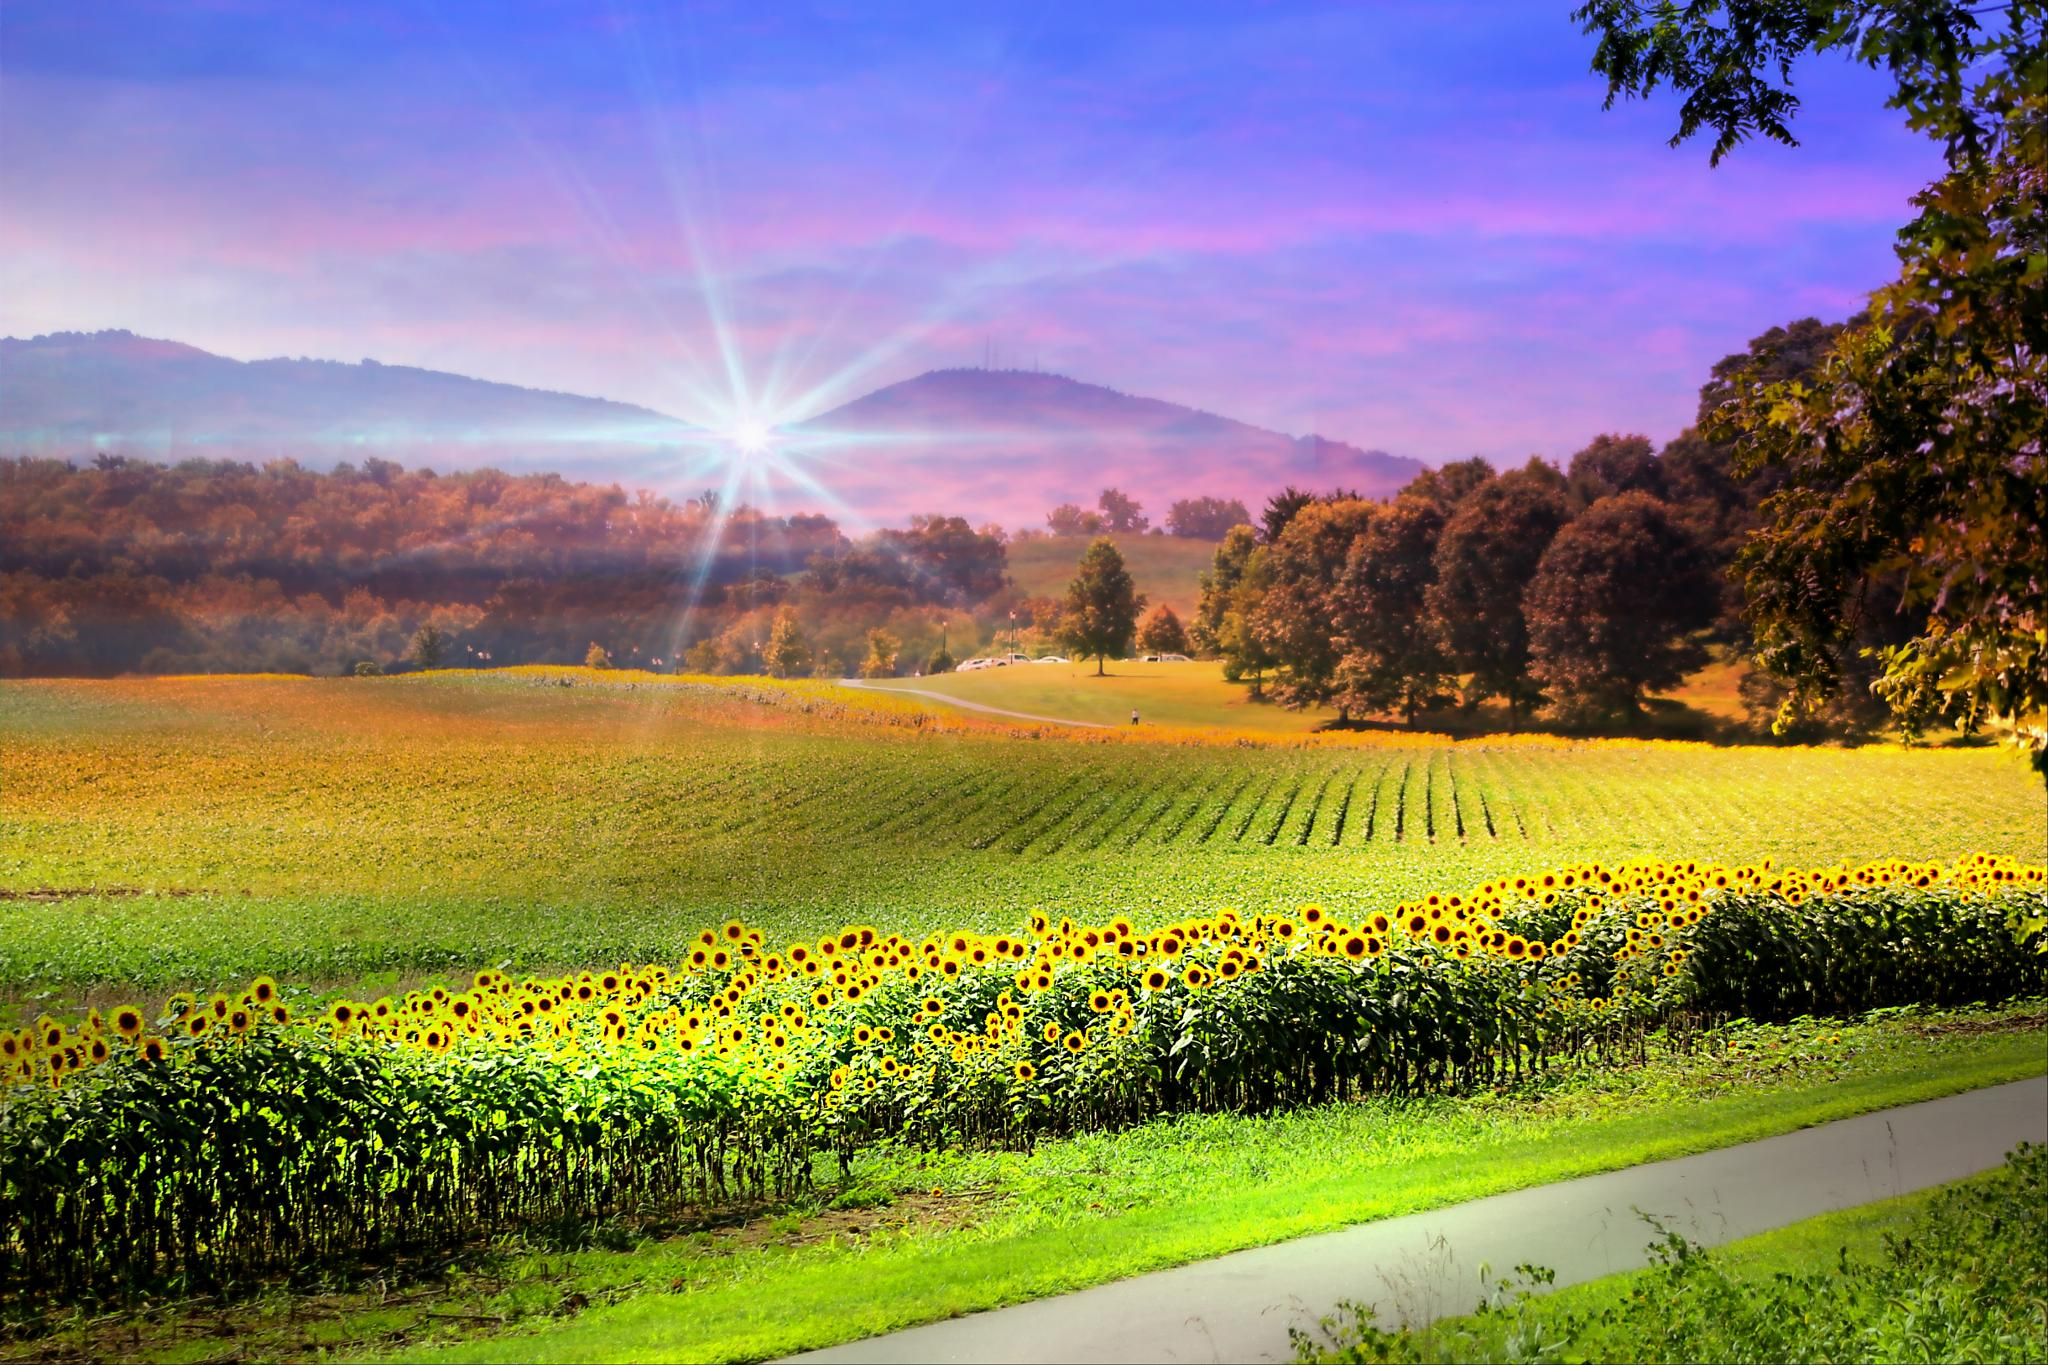 Biltmore Sunflower Field by darlenehoneycutt